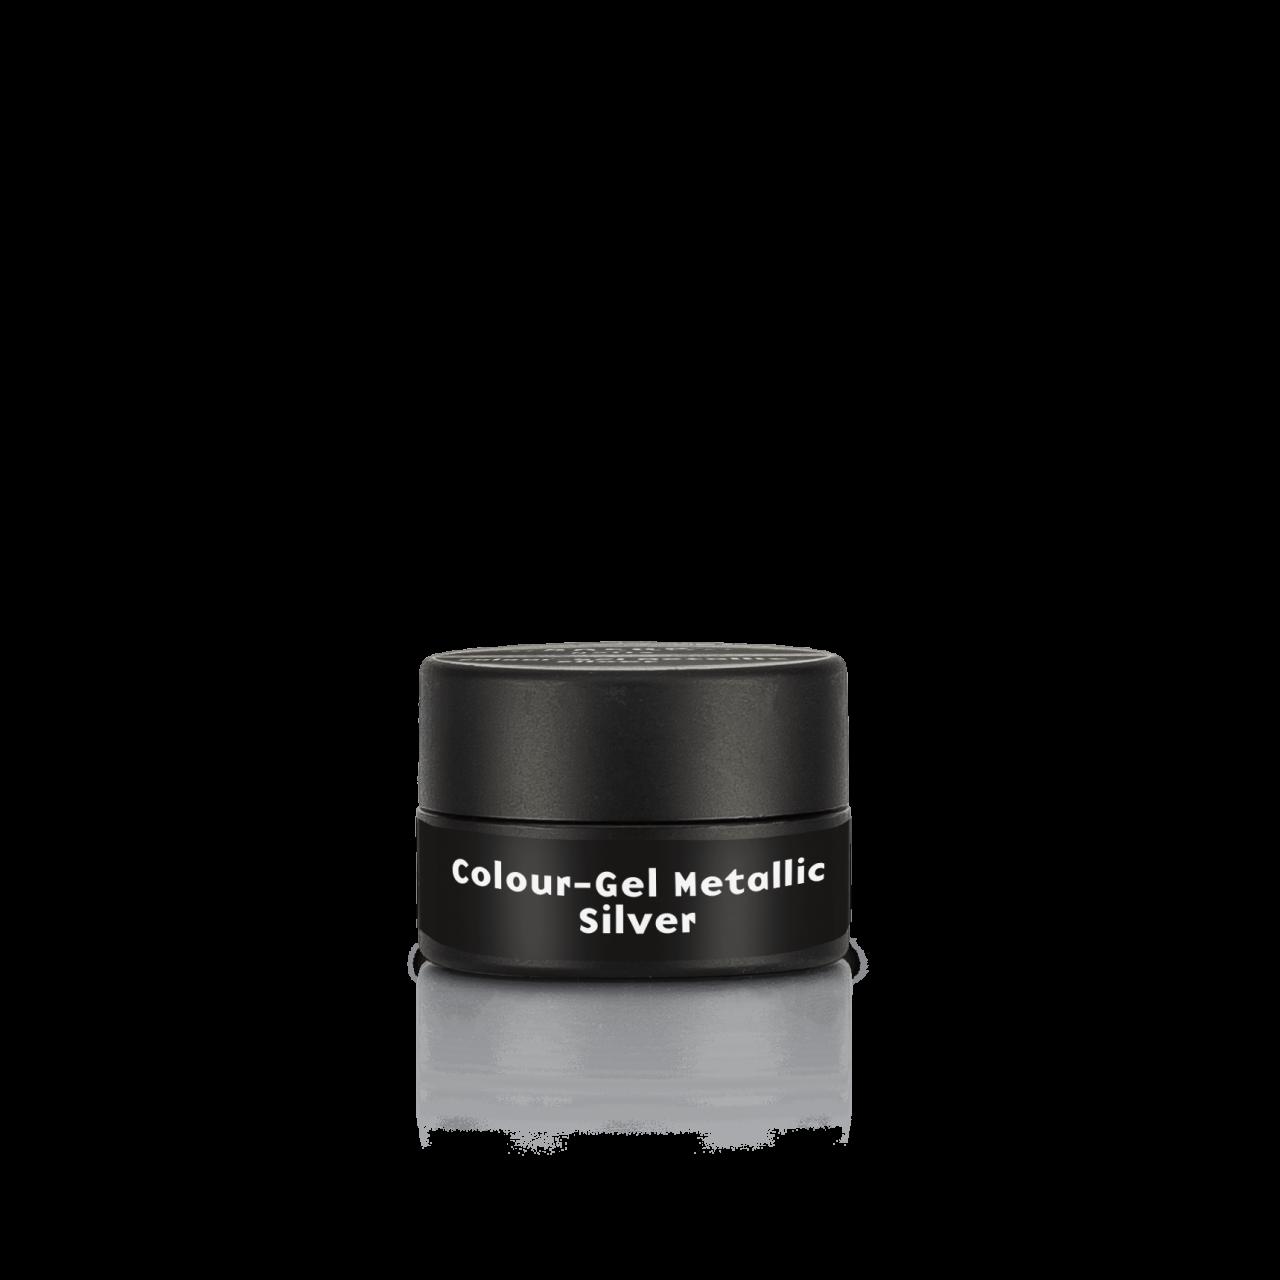 Colour-Gel Metallic Silver 5 ml